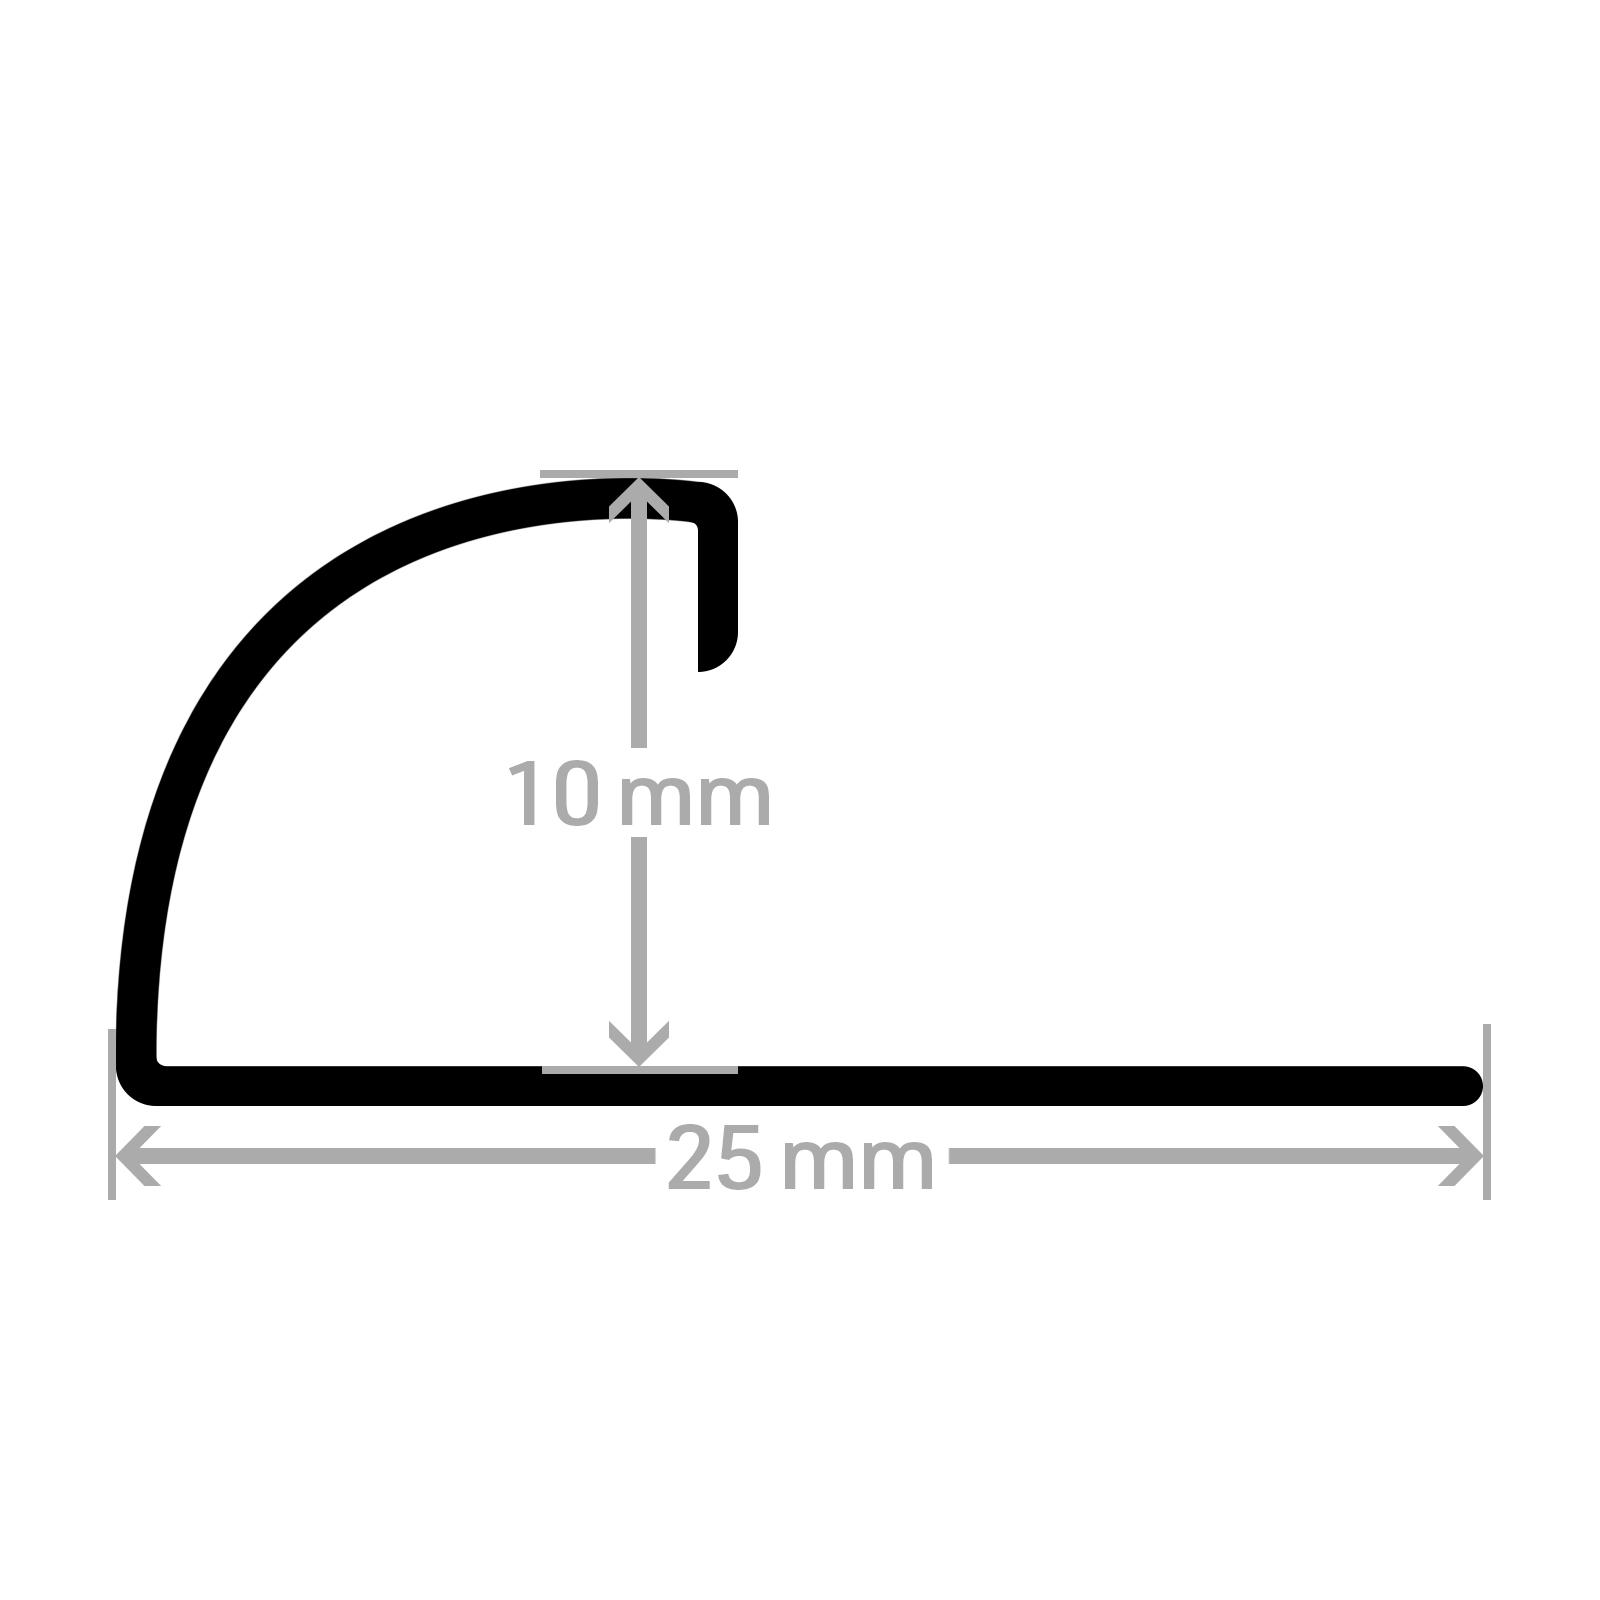 3-60-m-HORI-Fliesenprofil-Fliesen-Schiene-Edelstahl-V2A-Quadro-Winkel-250cm Indexbild 17